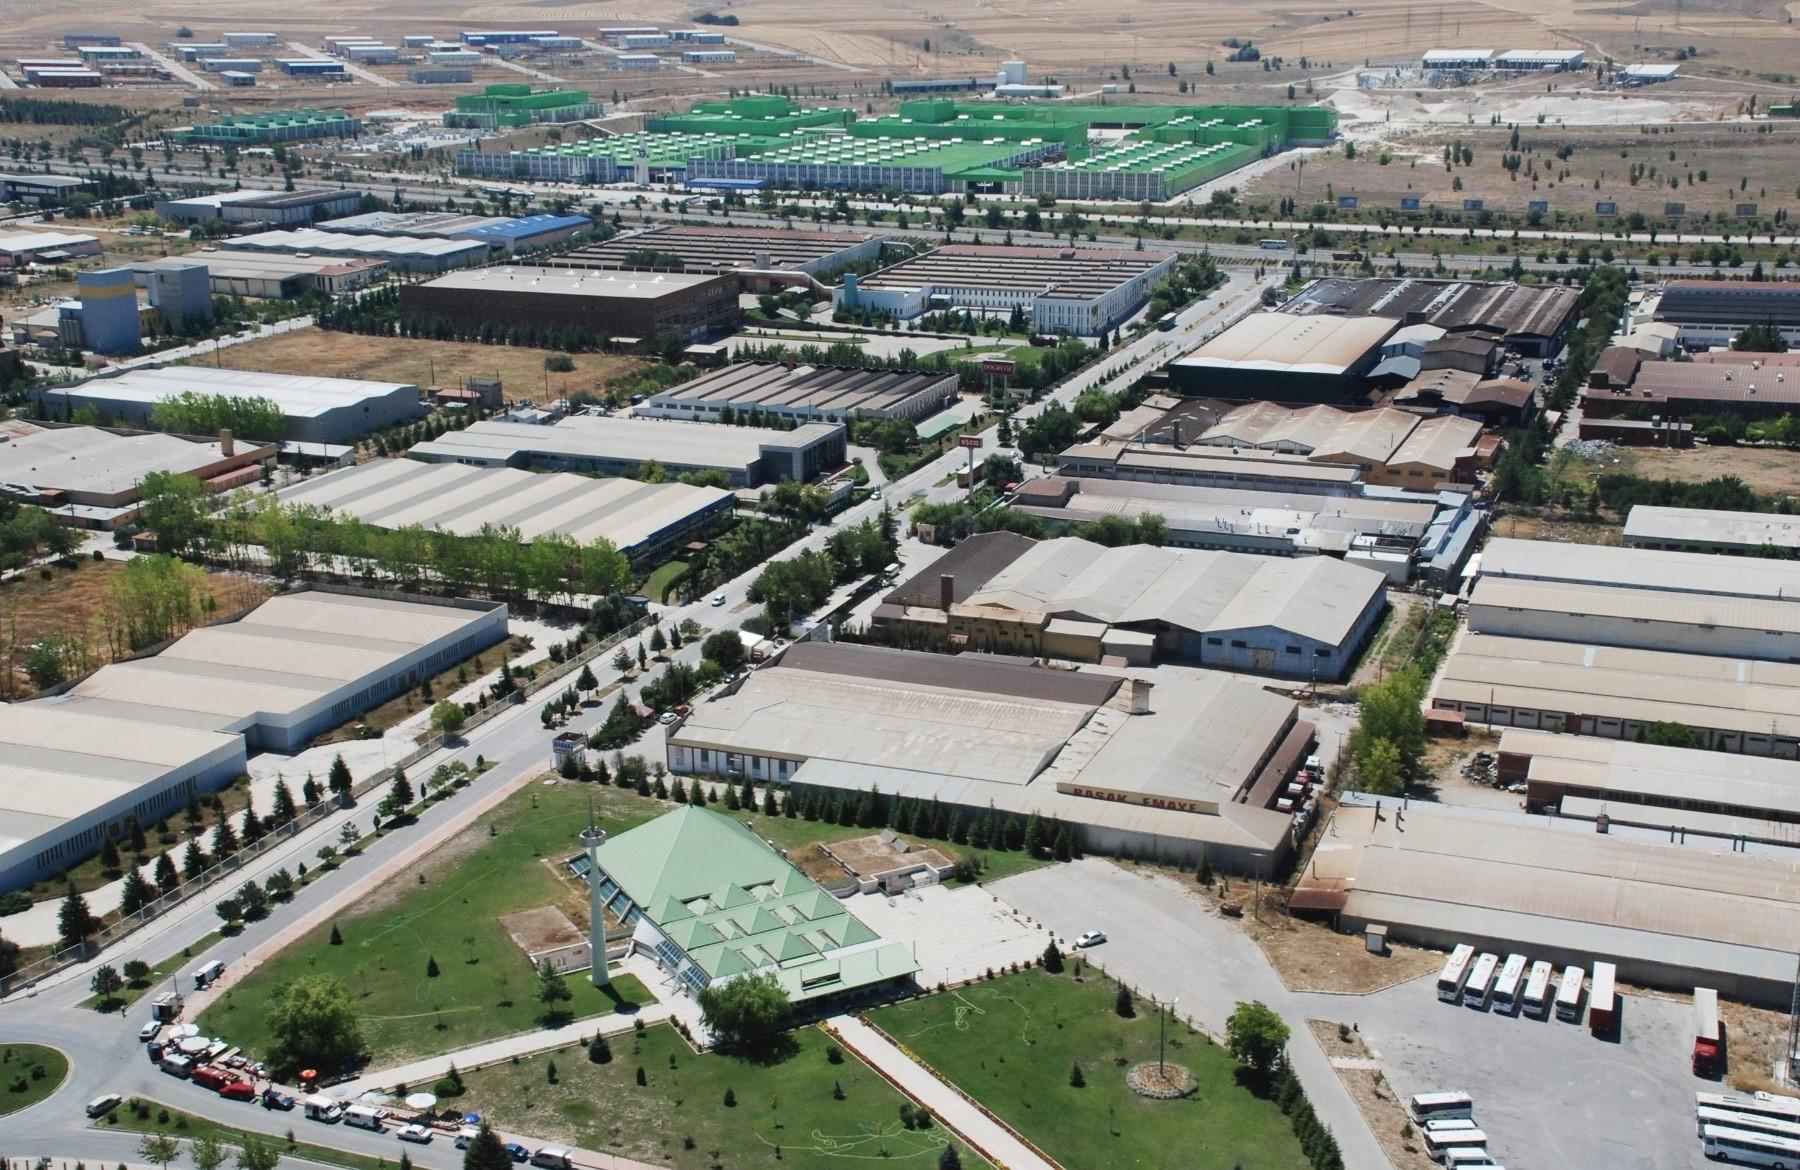 An aerial view of an organized industrial zone in Bursa.